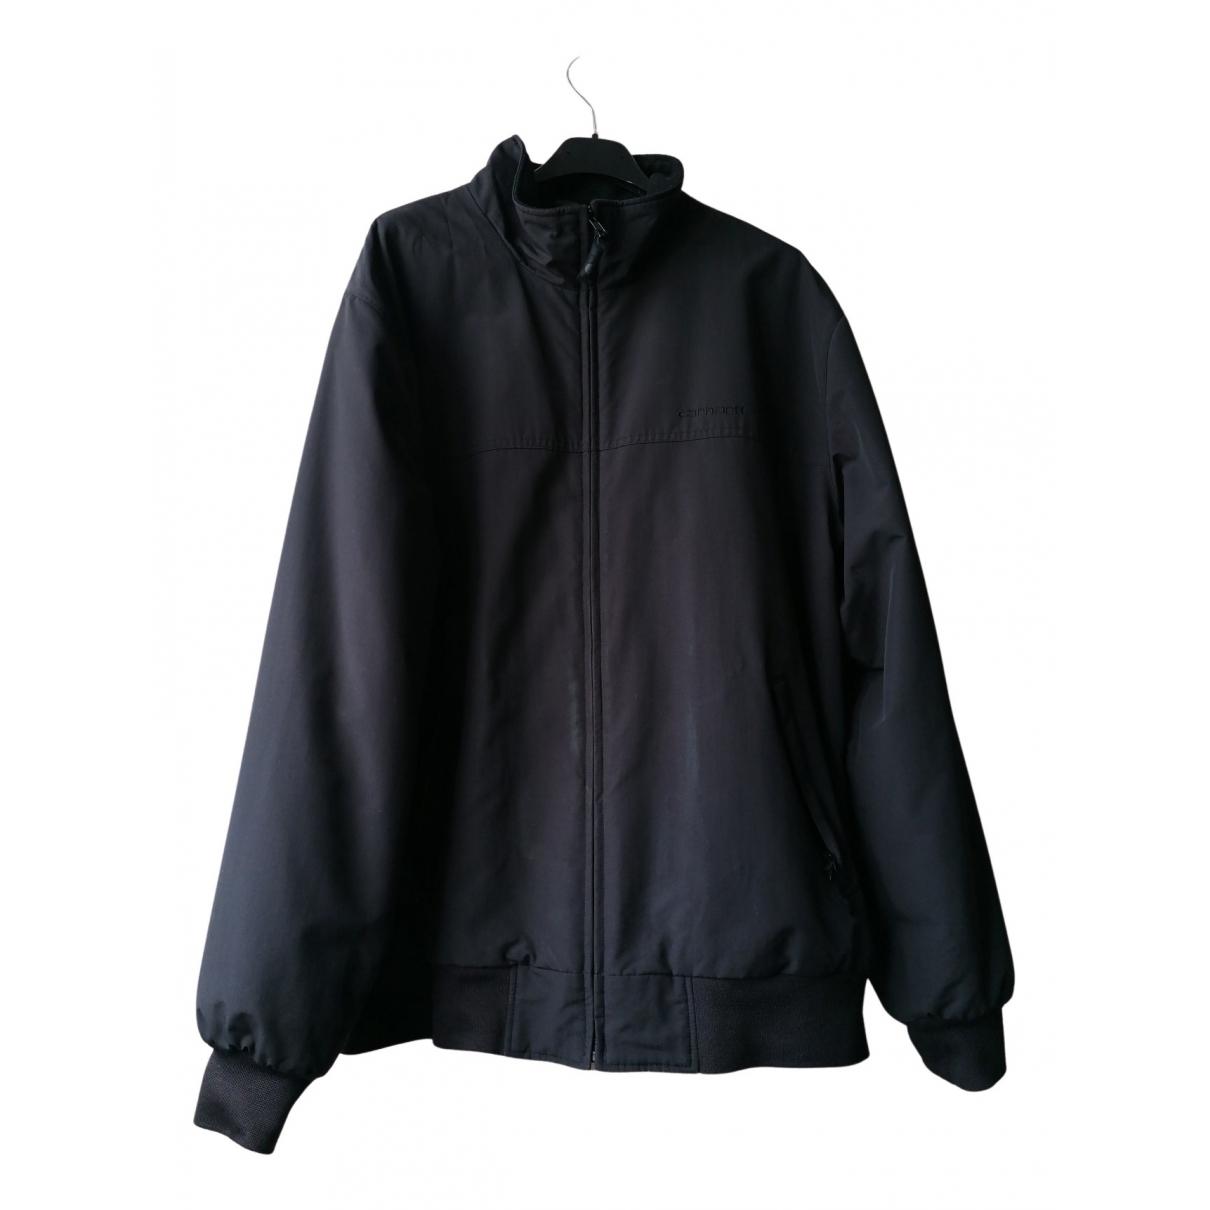 Carhartt \N Black jacket  for Men L International